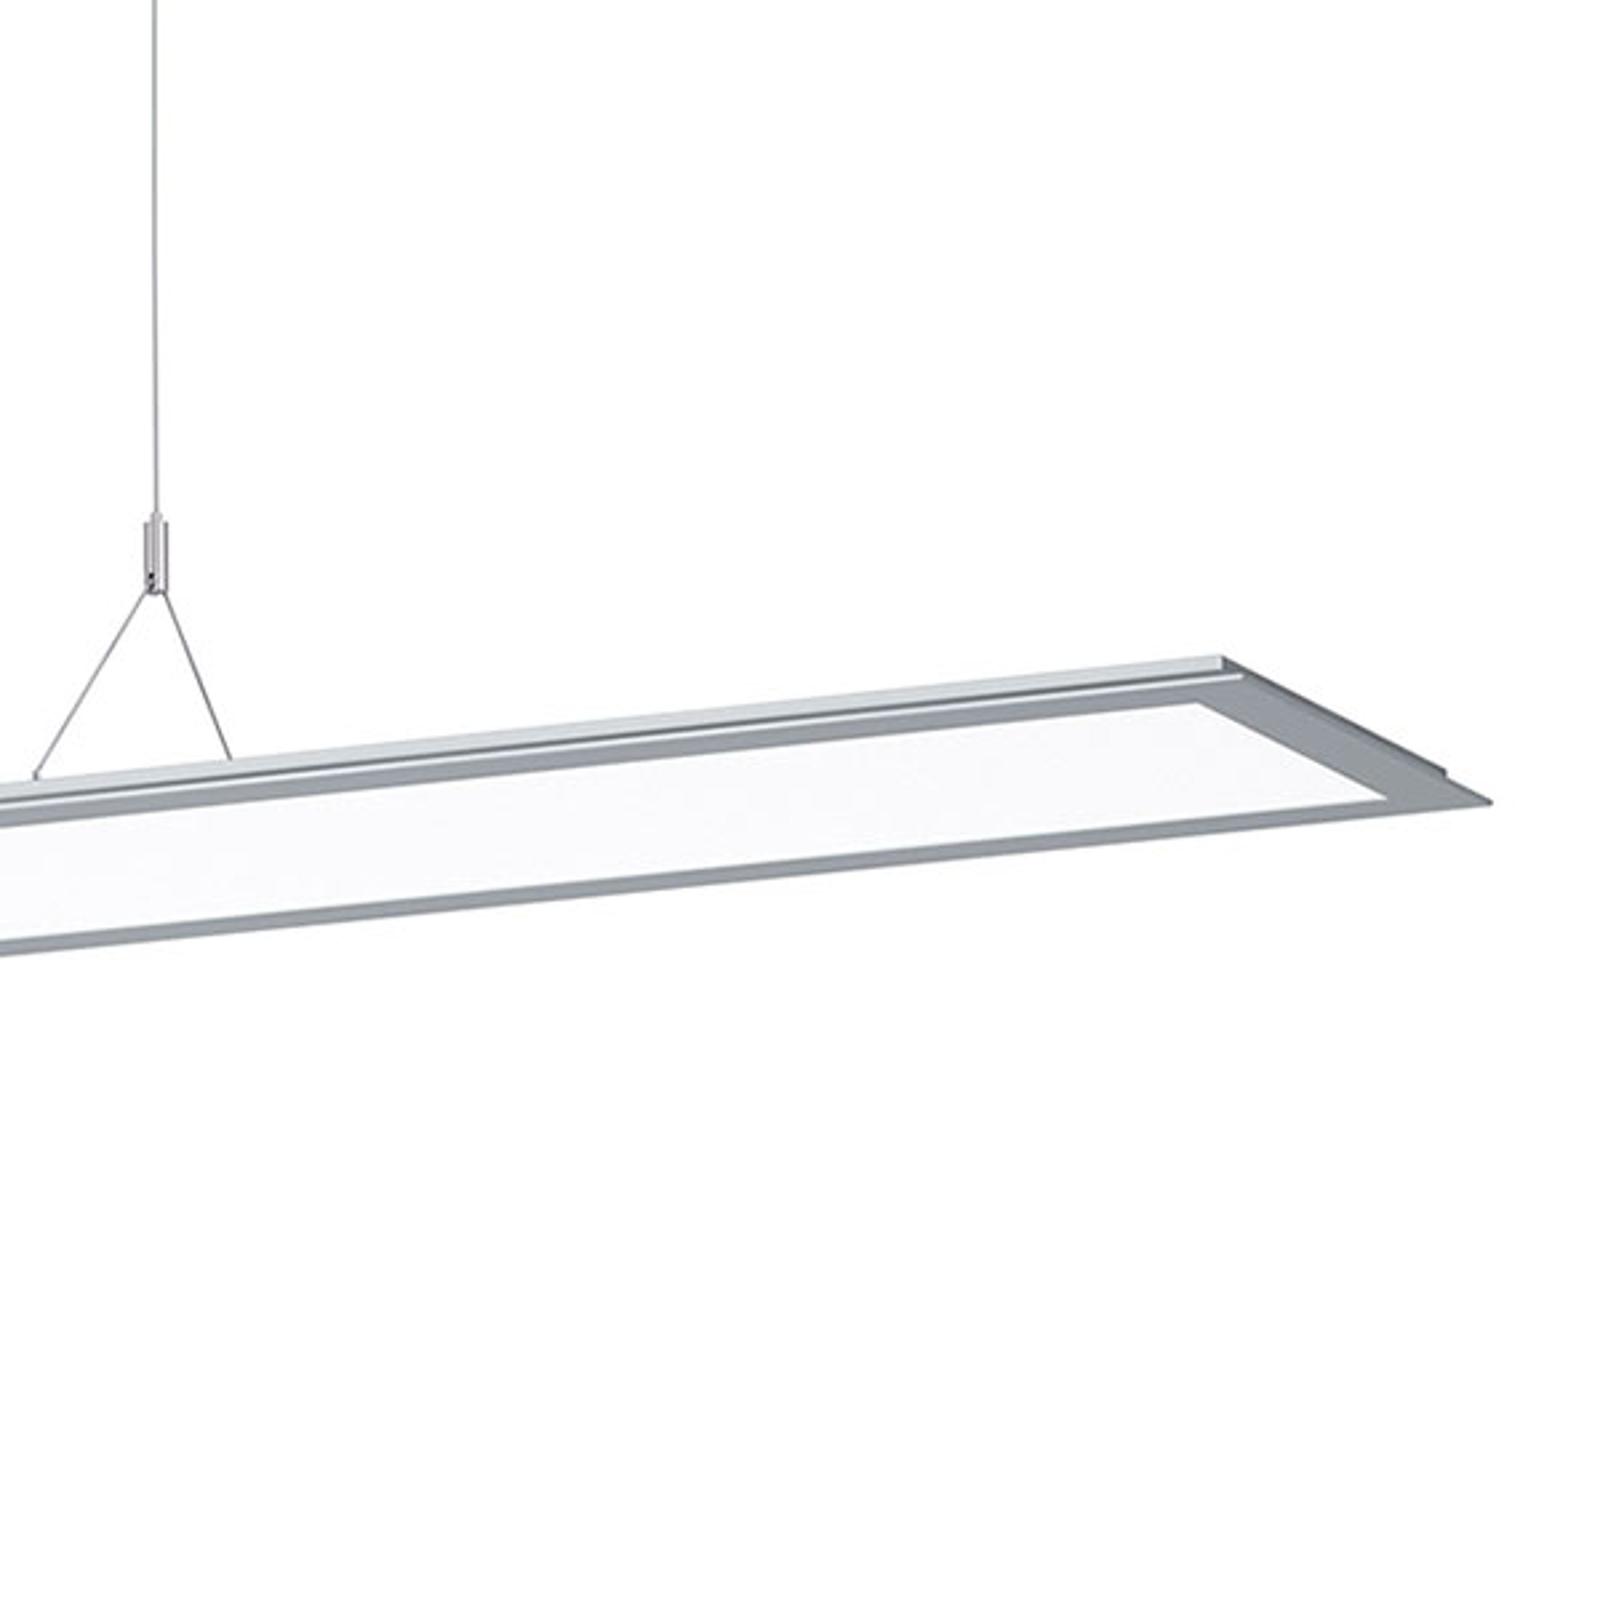 Lampa wisząca LED SL713PL 124cm DALI 9250 lm szara